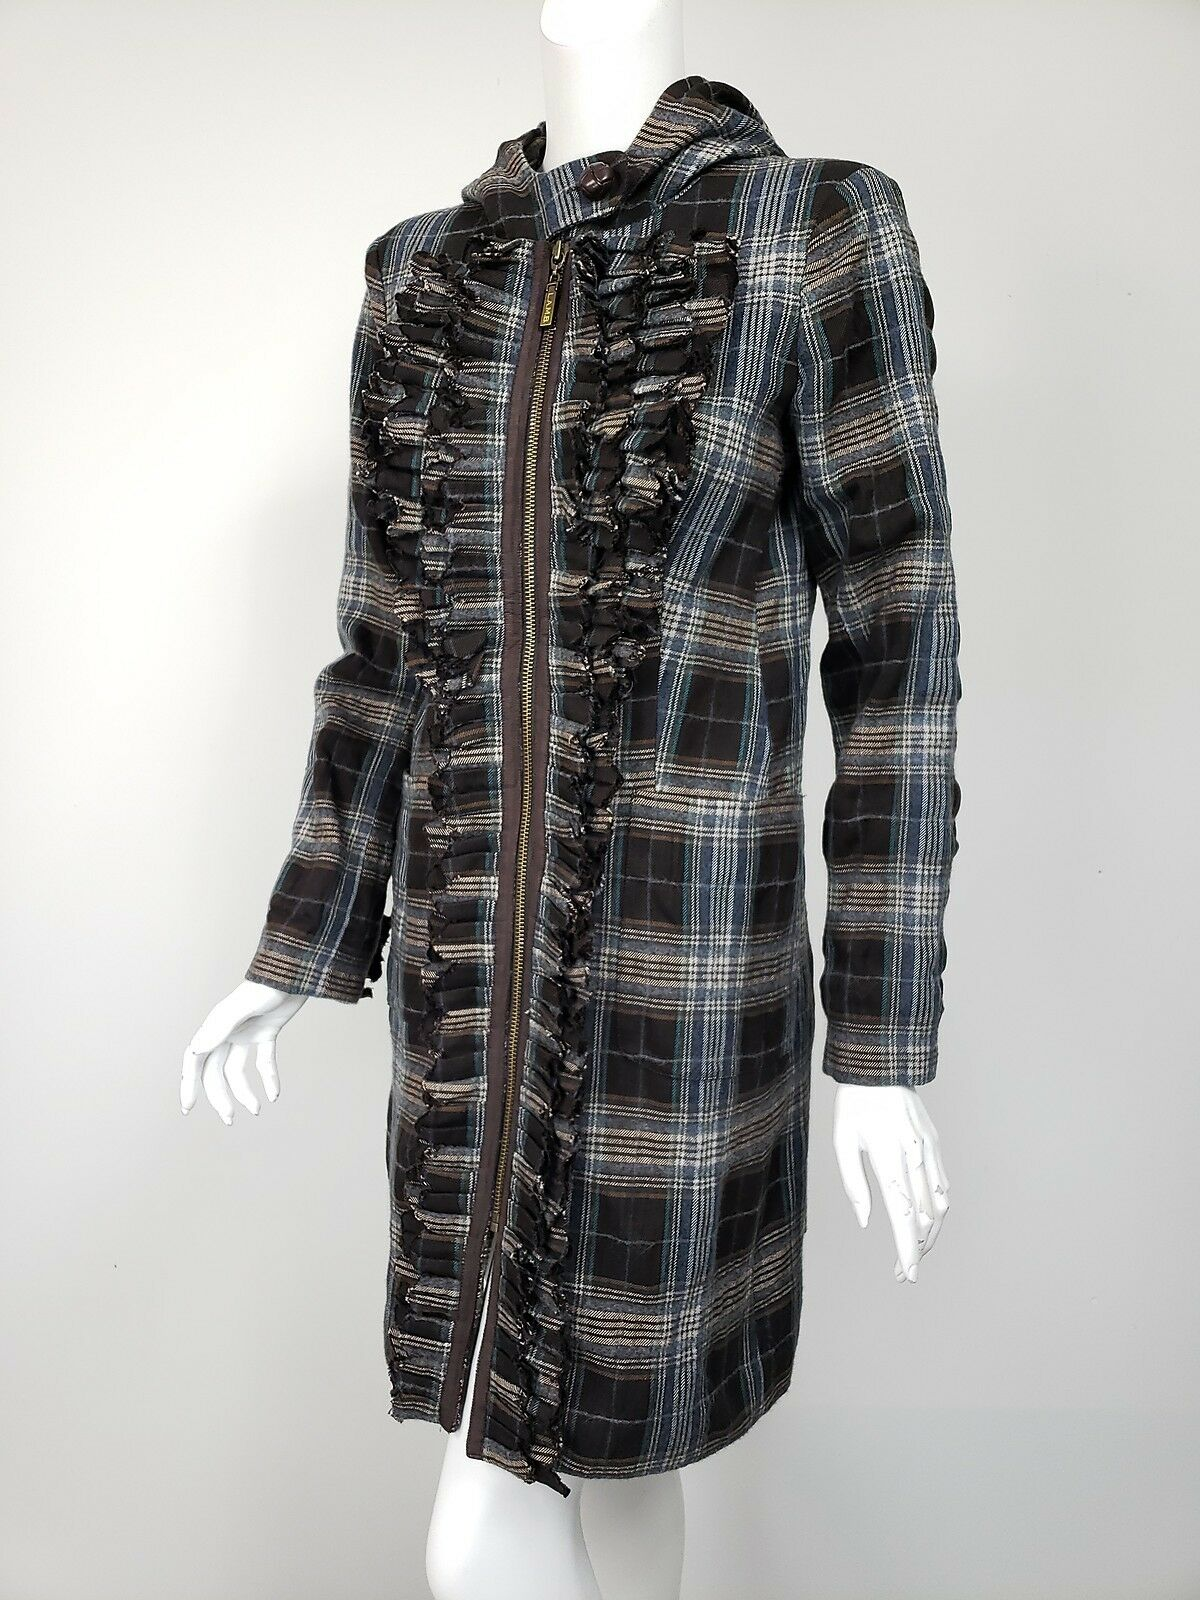 L.A.M.B. Gwen Stefani Brown bluee White Plaid Cotton Wool Ruffled Front Coat sz 4